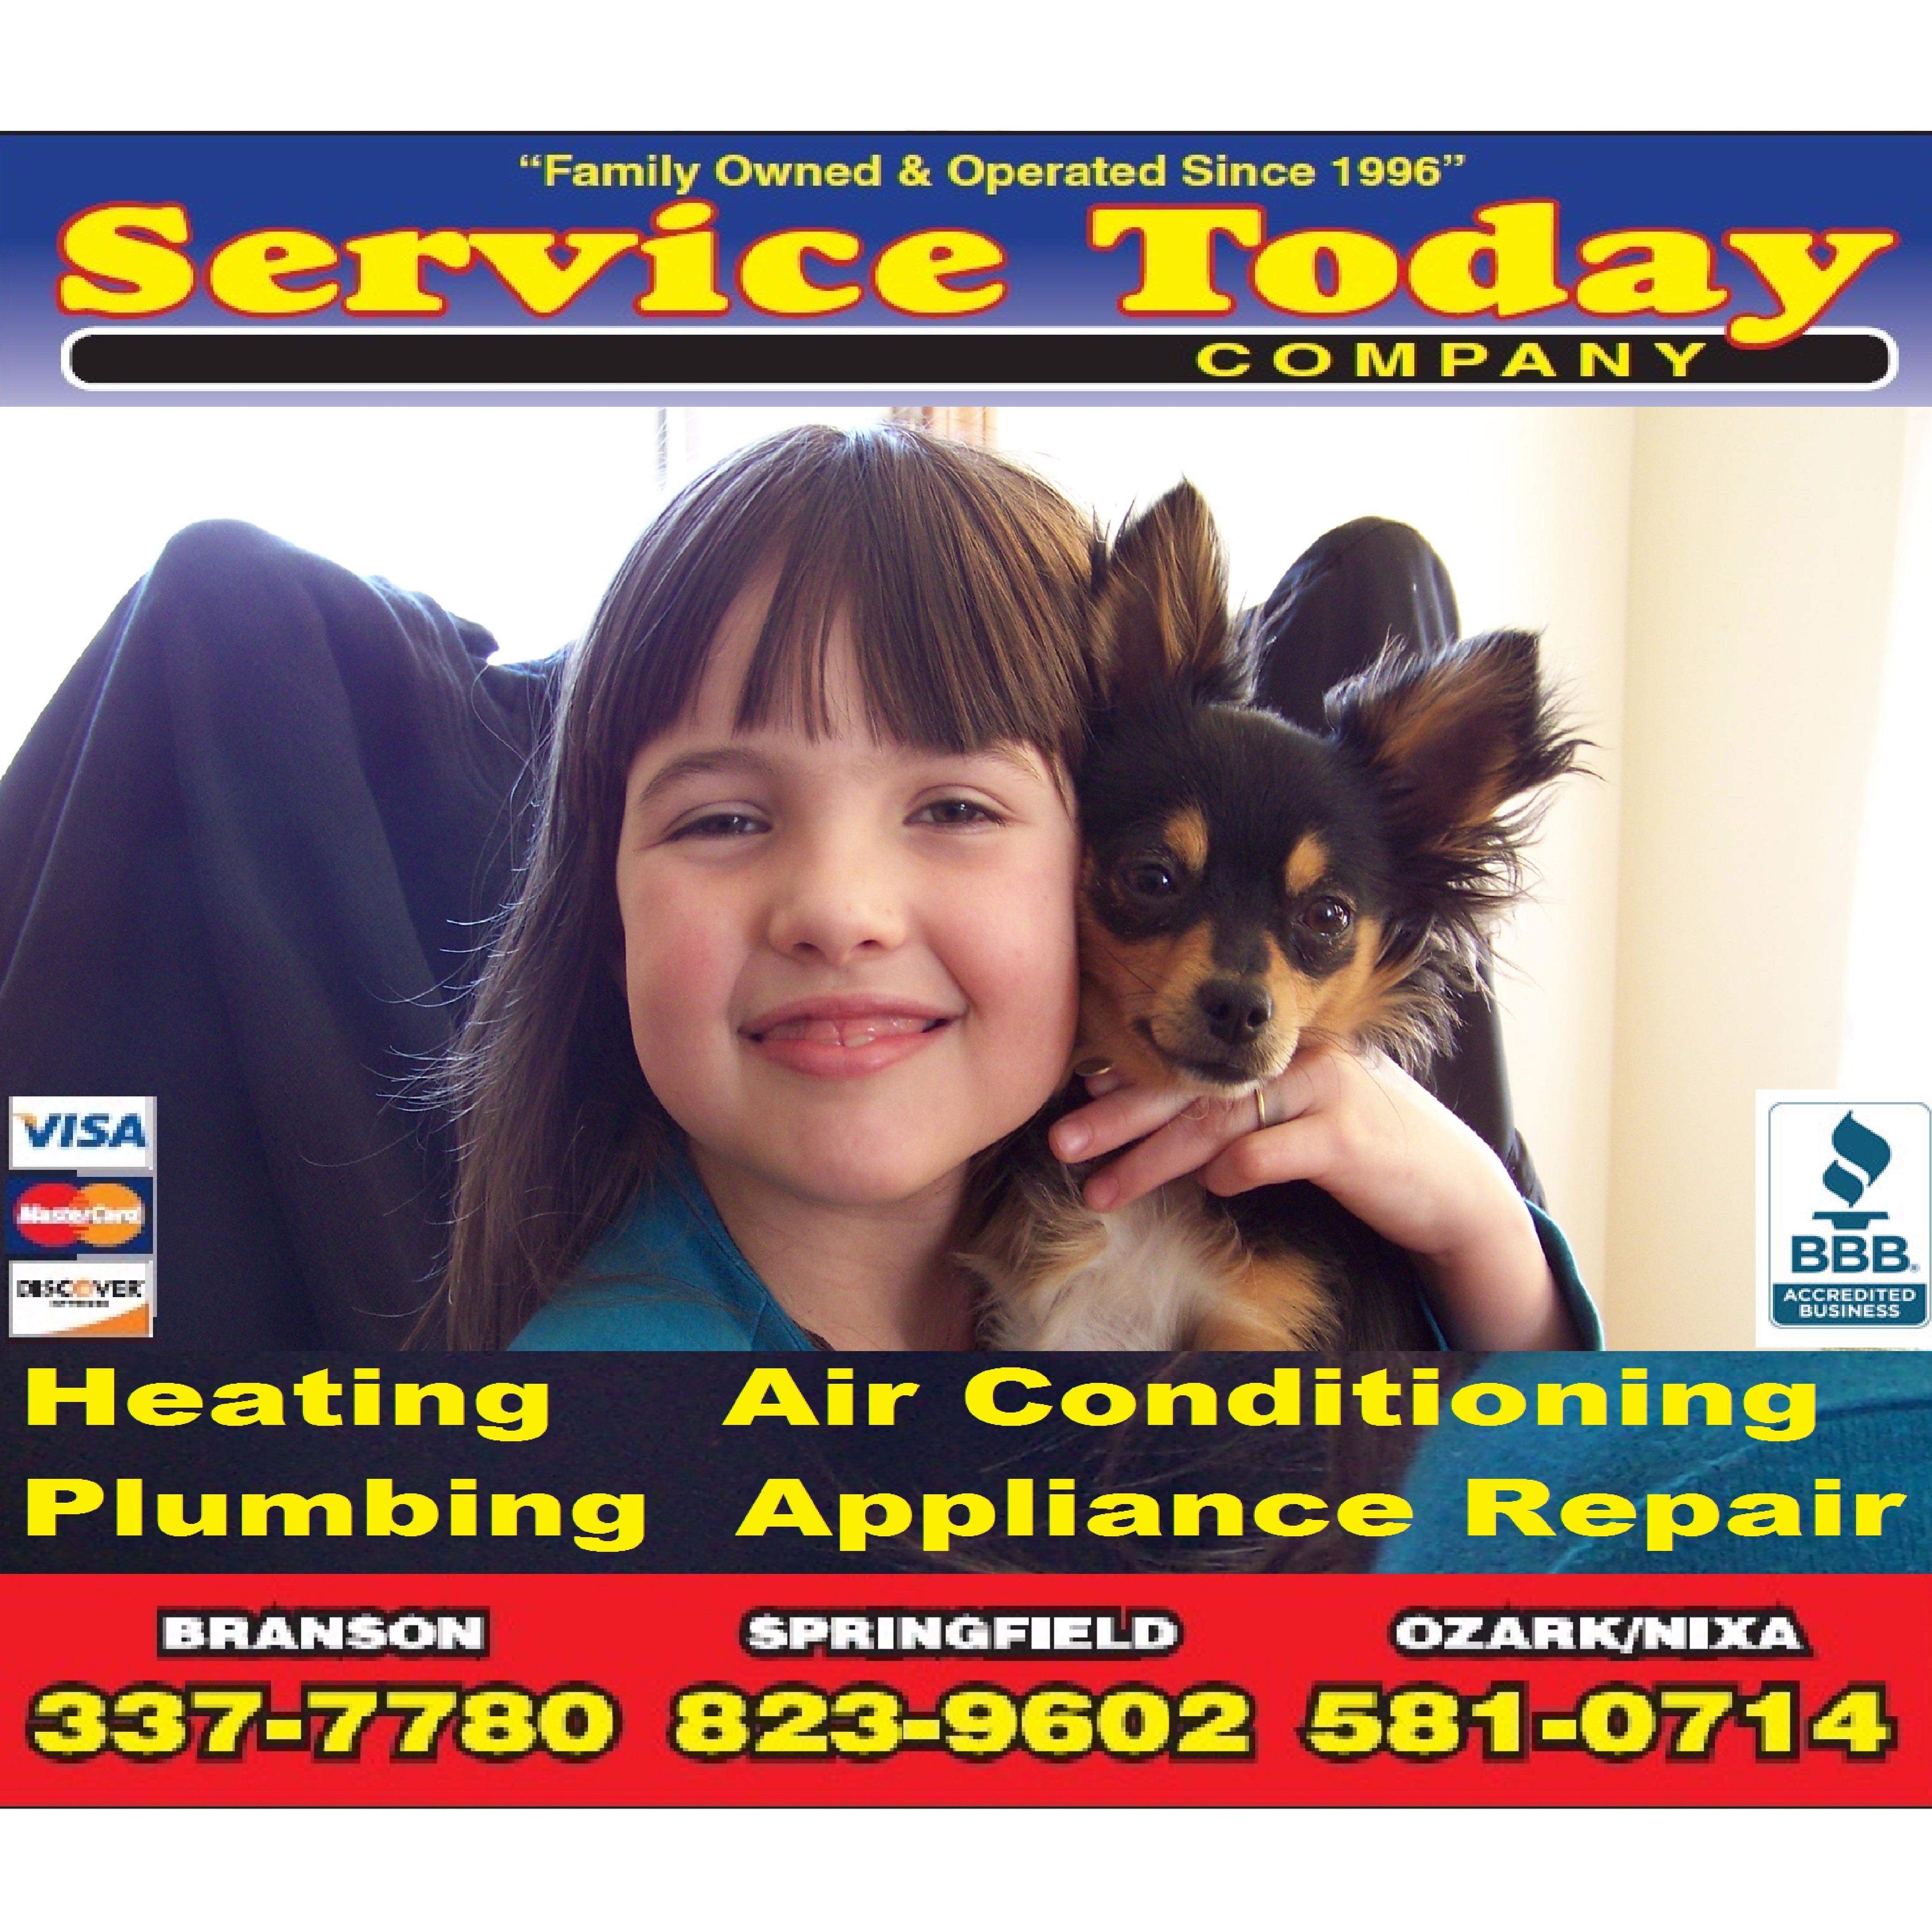 Service Today Company Inc. image 4